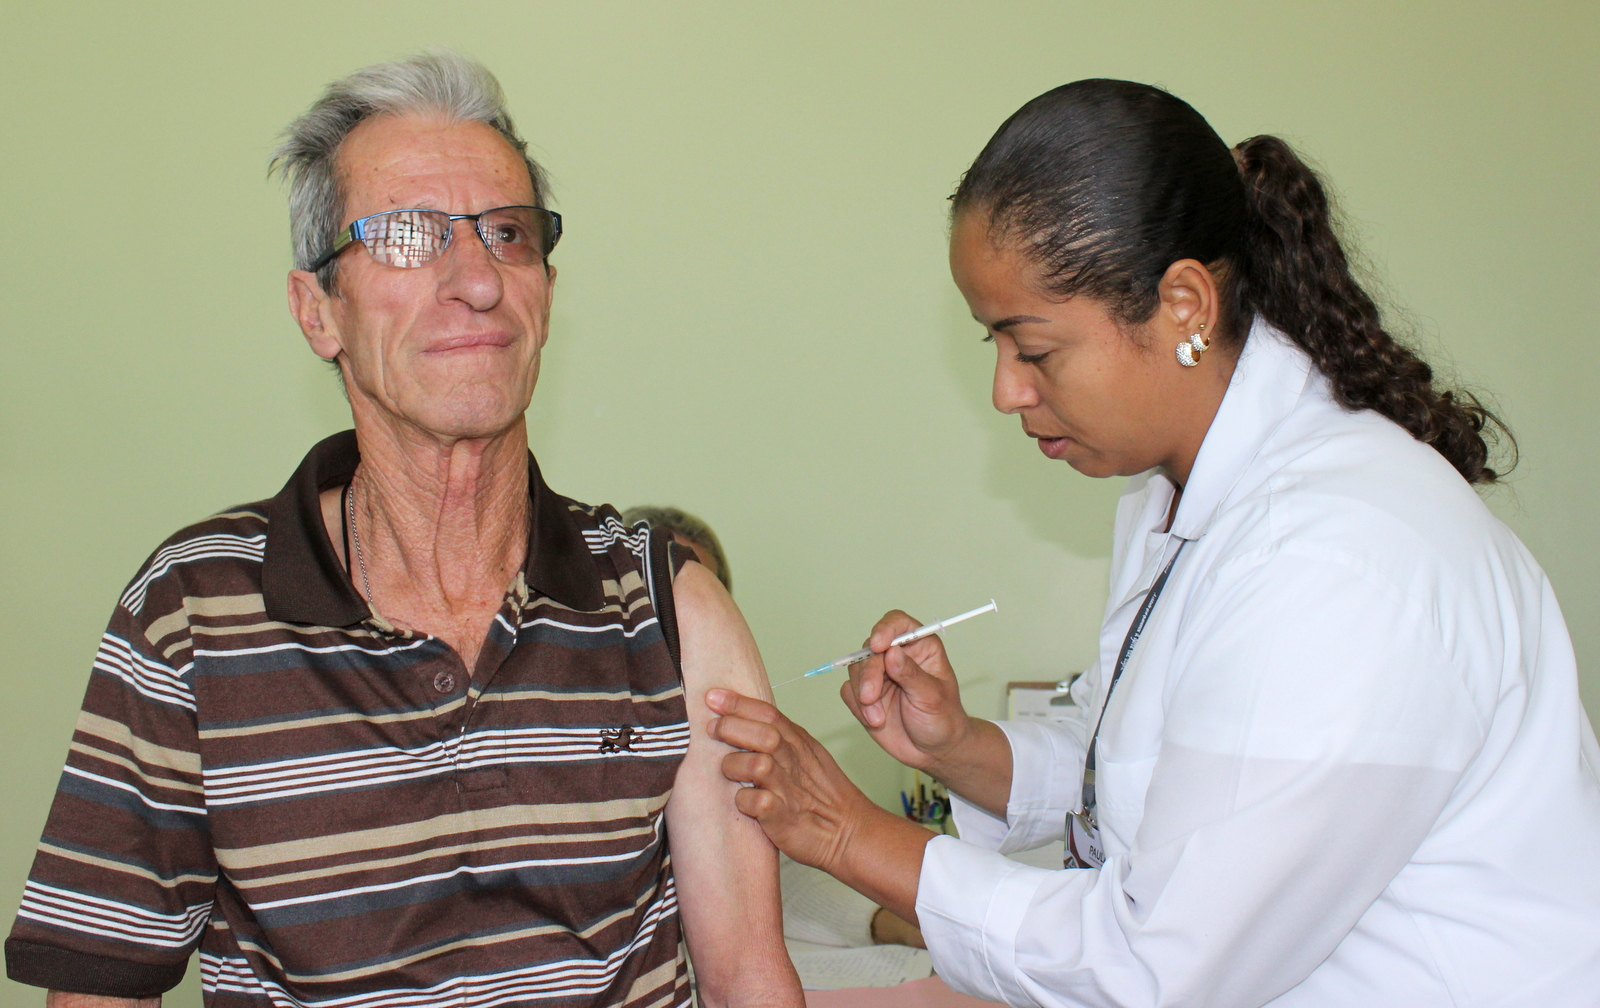 Vacina contra a gripe Influenza é disponibilizada nas Unidades Básicas de Saúde de Criciúma